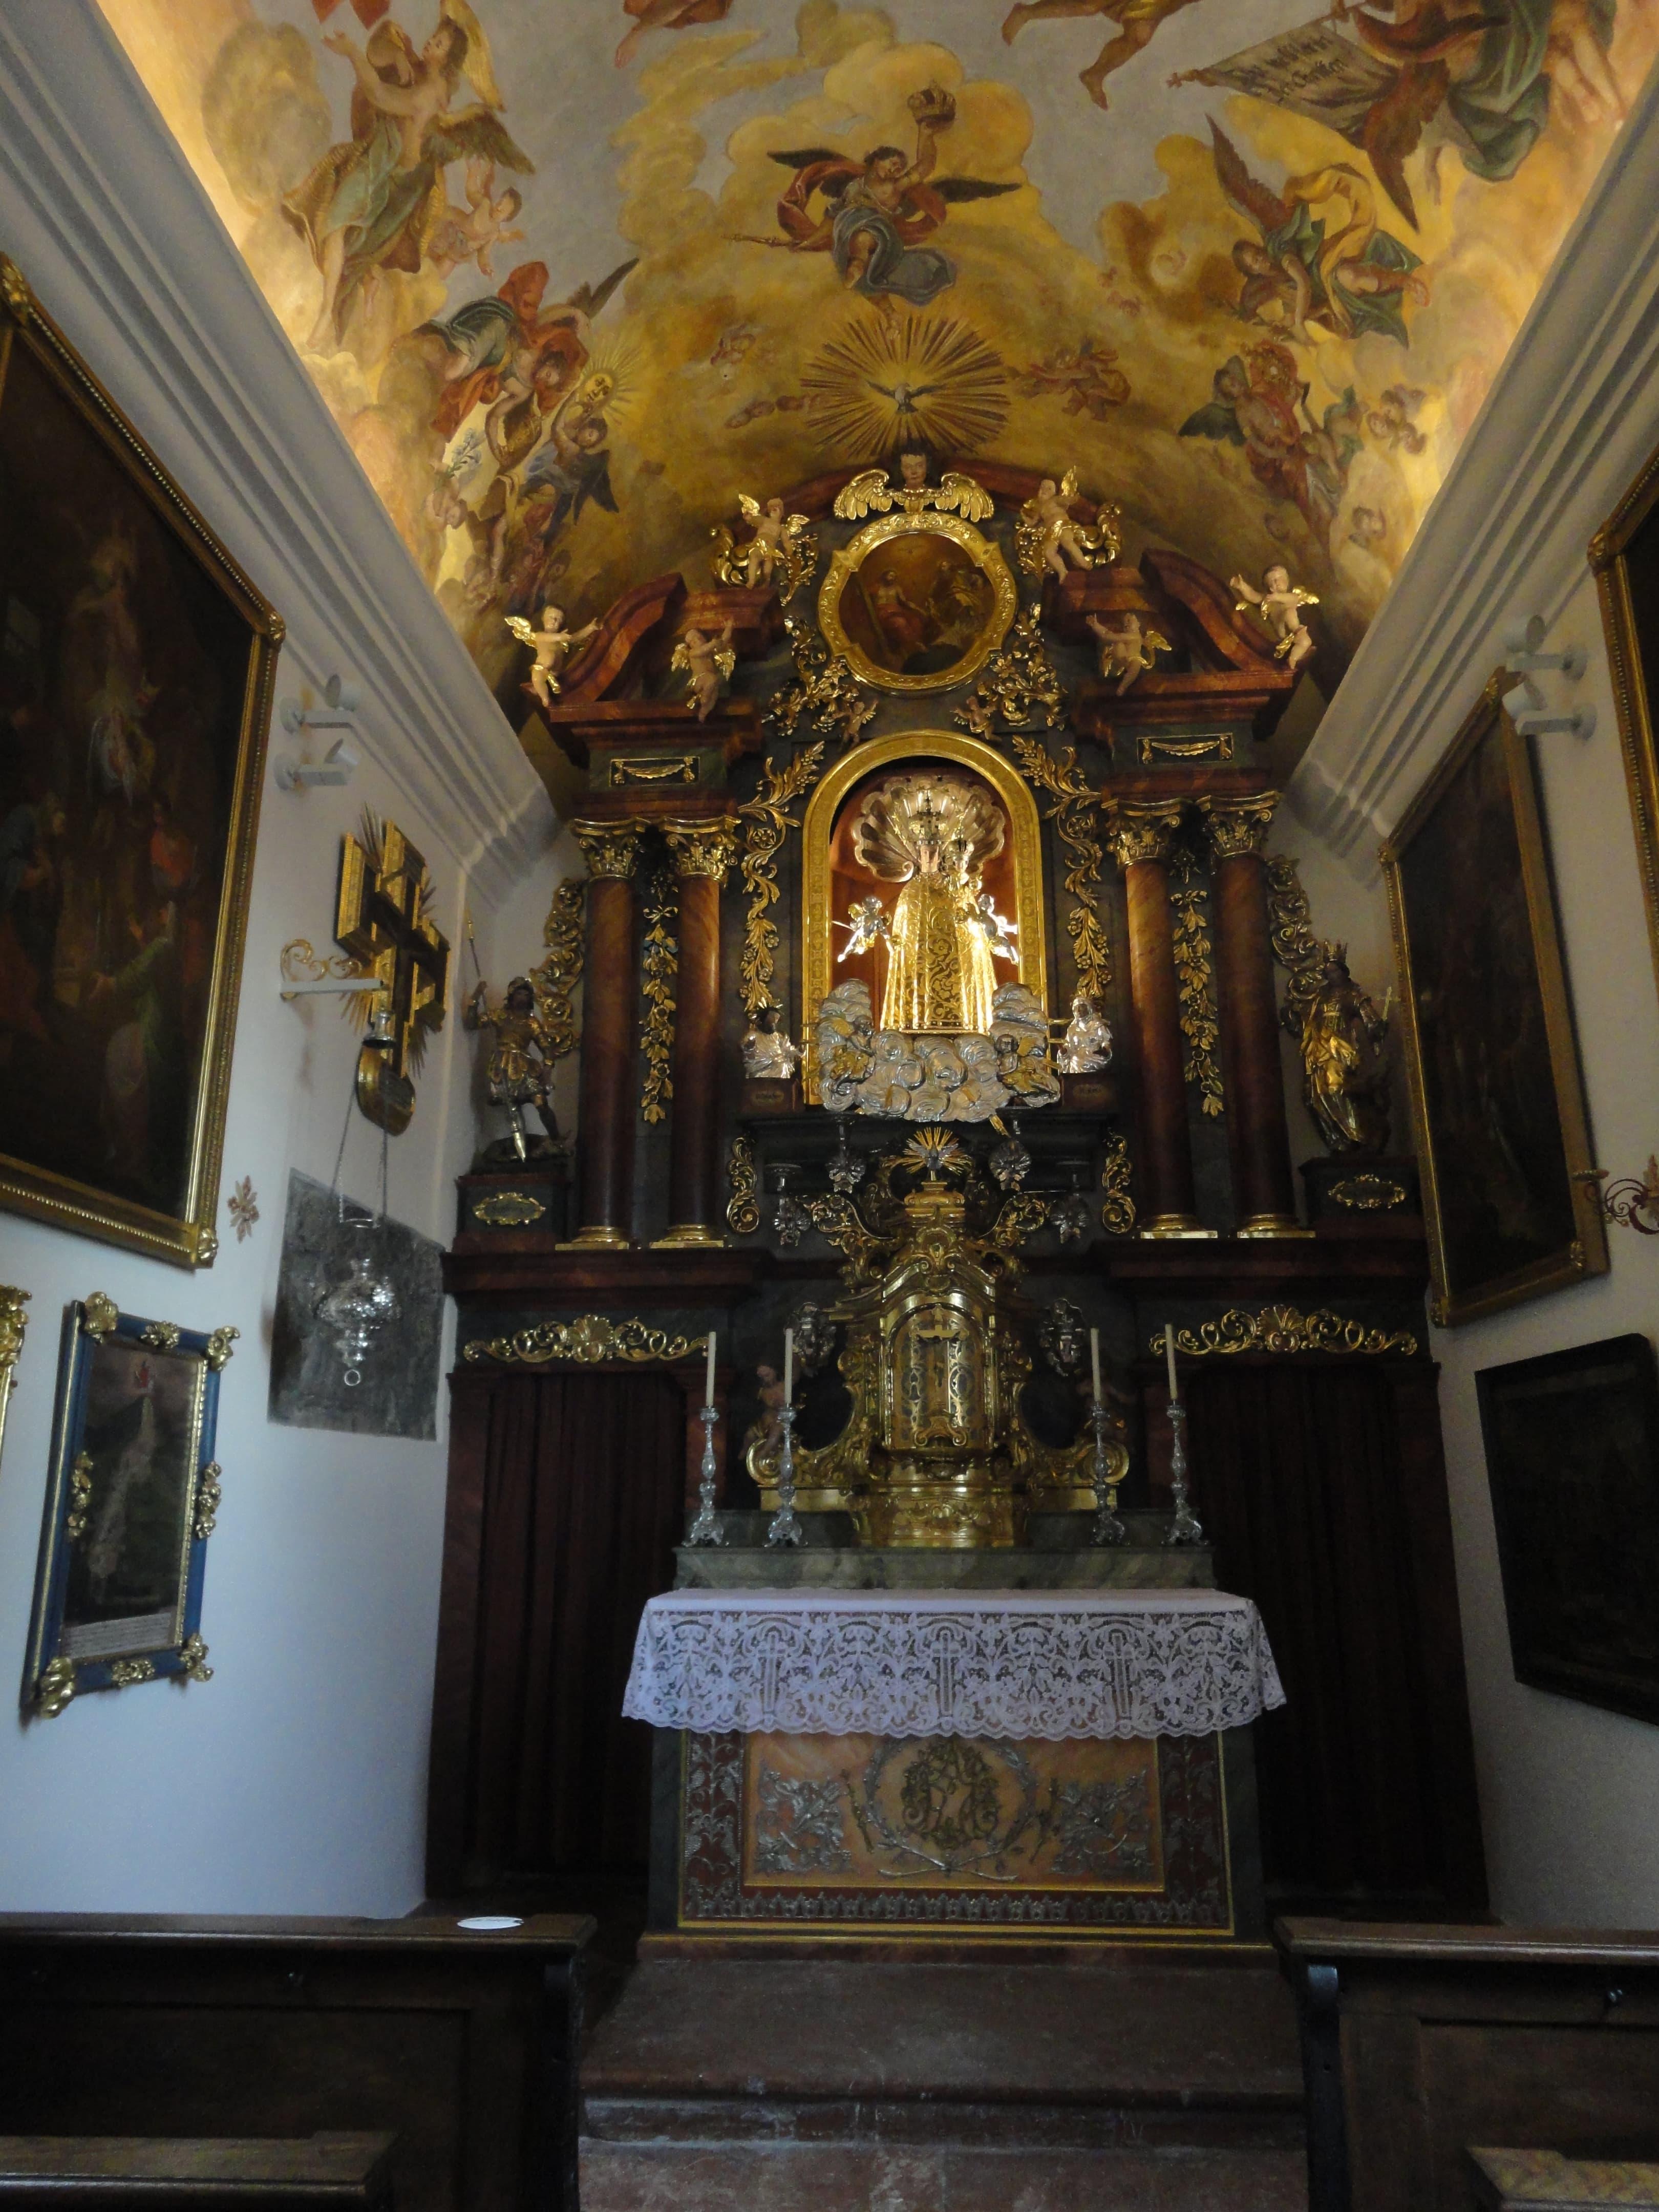 Loretokapelle und Benefiziatenhaus Innen Hochaltar